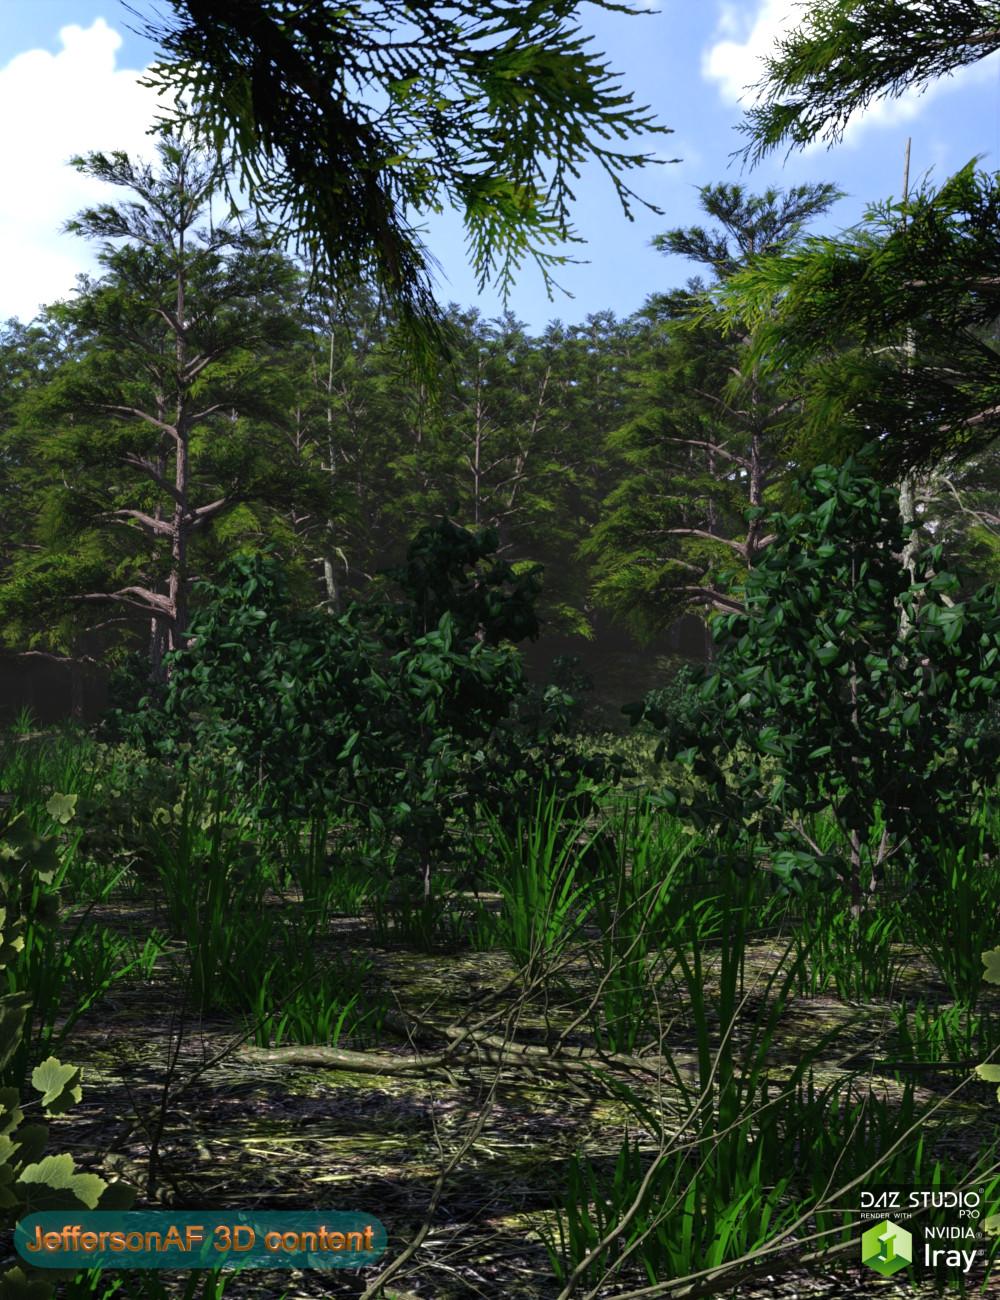 Mountain Forest by: JeffersonAF, 3D Models by Daz 3D